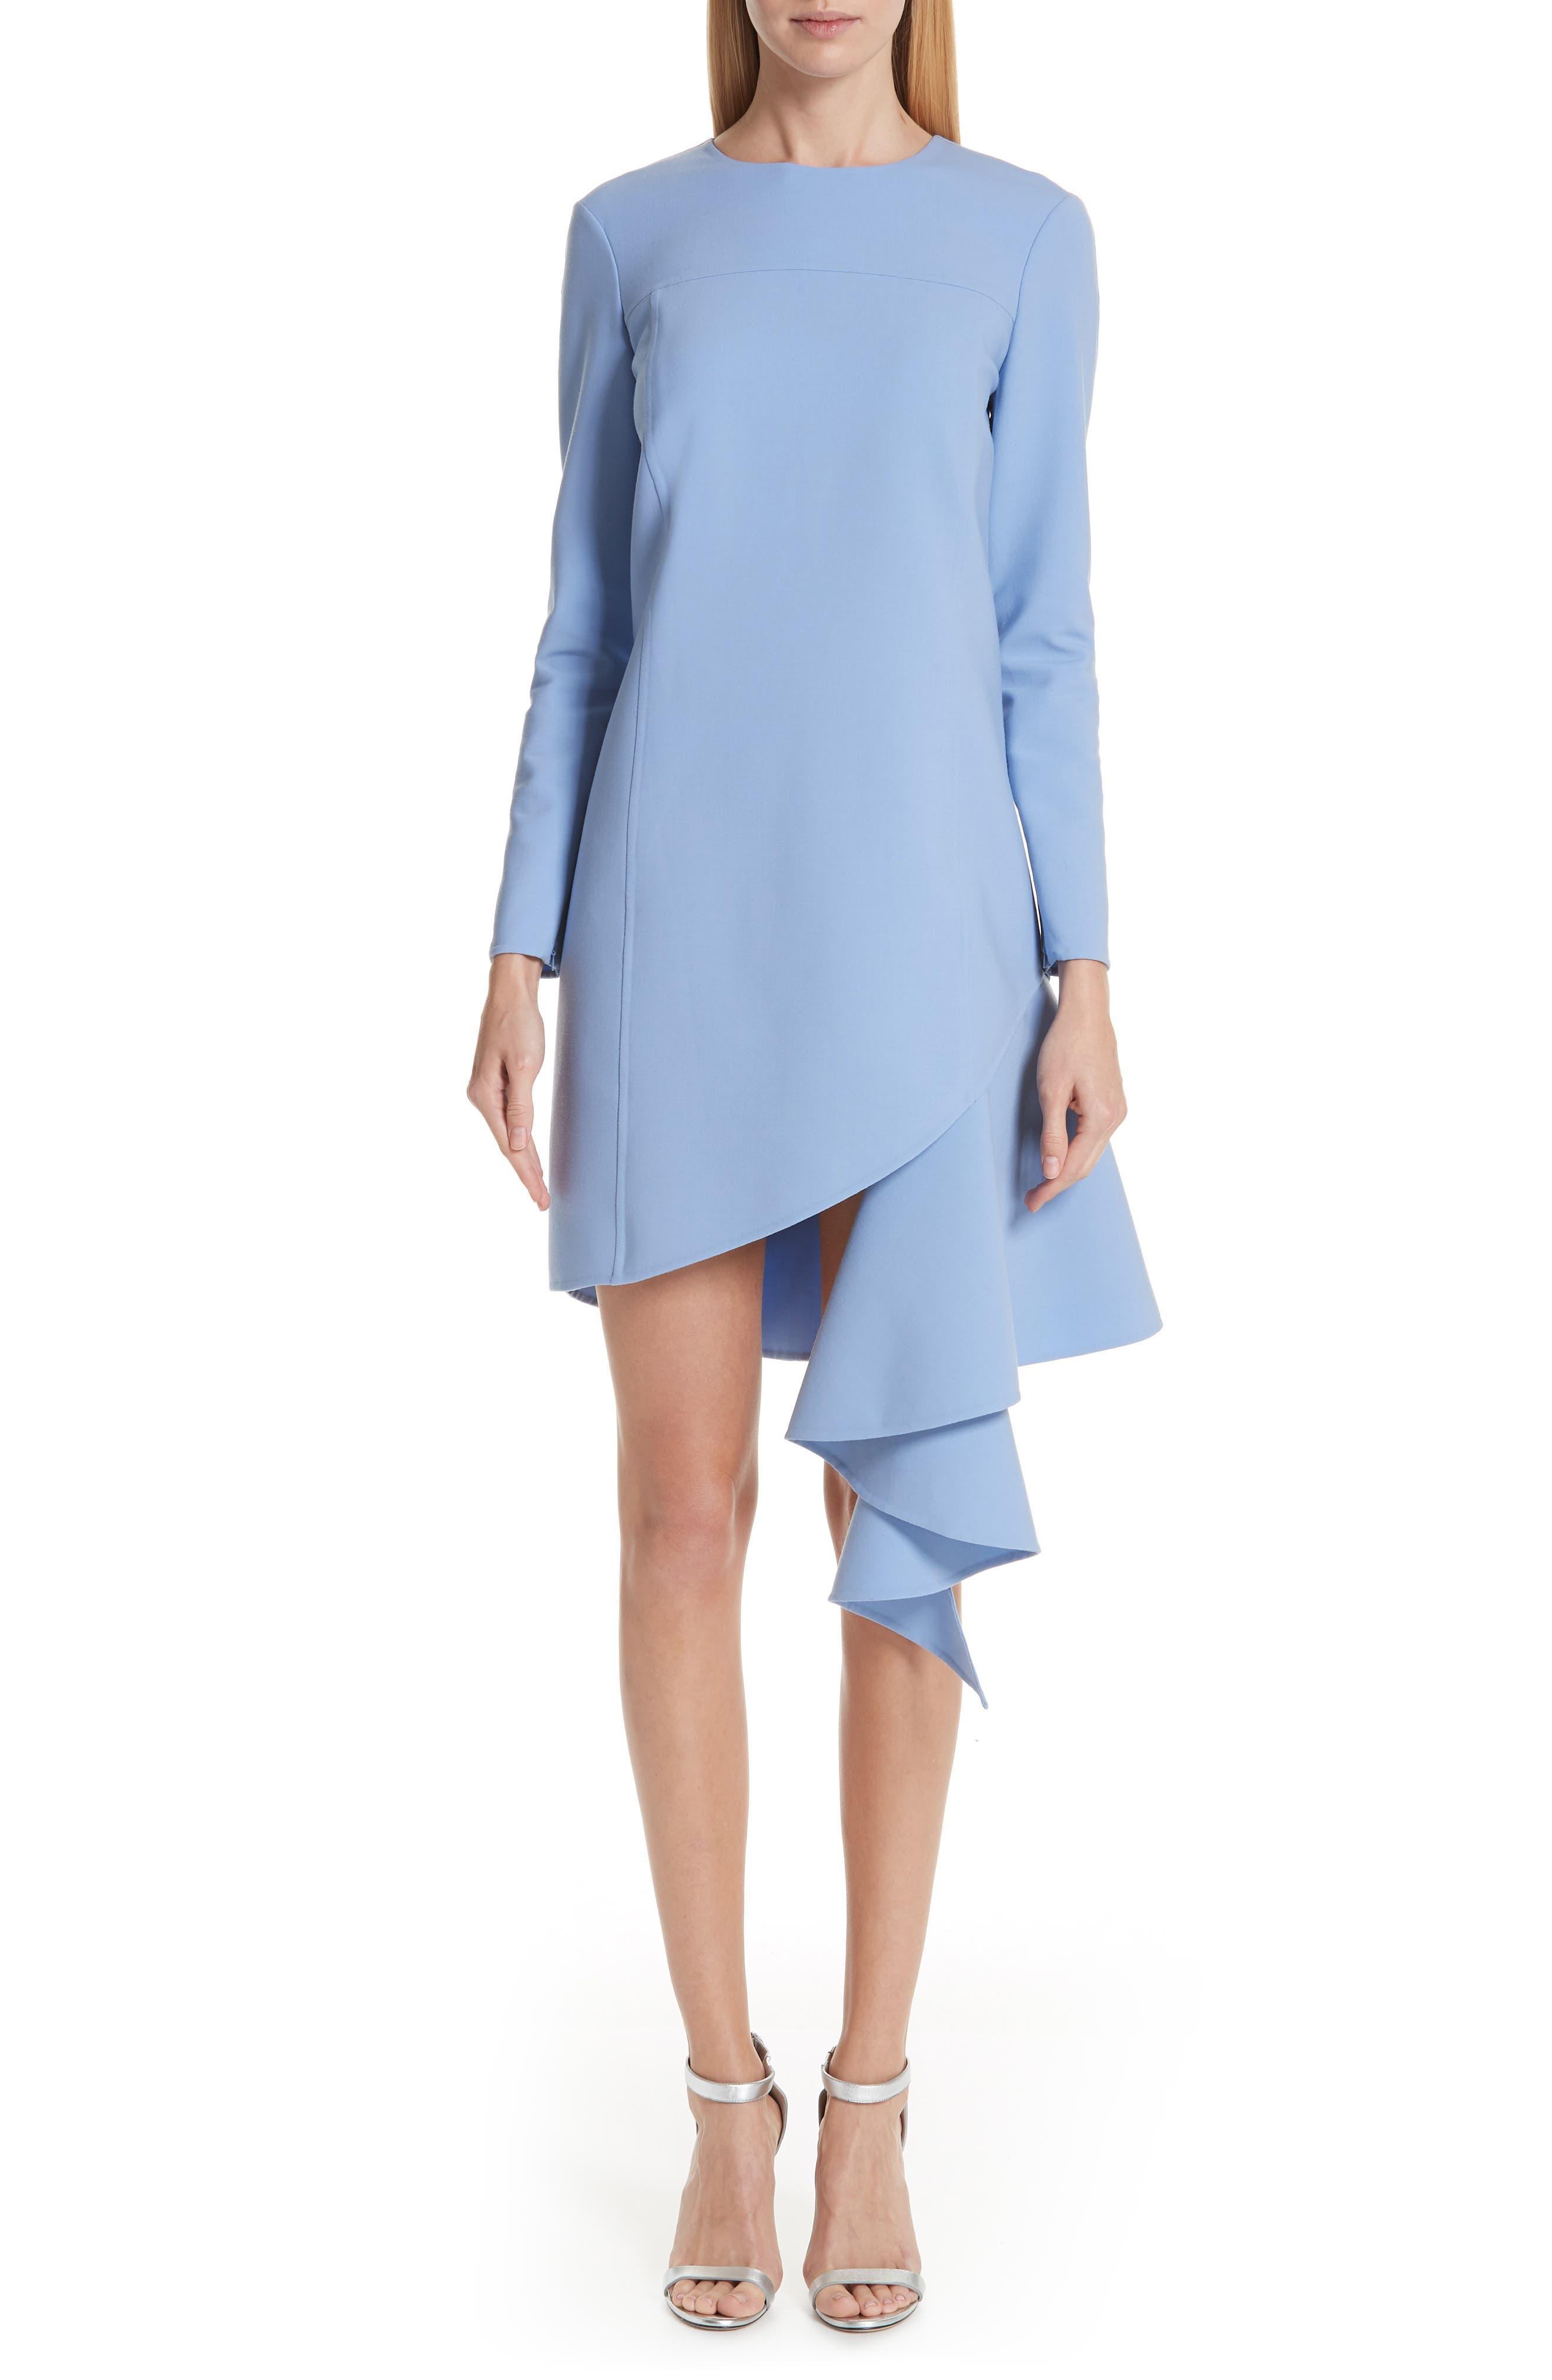 Oscar De La Renta Asymmetrical Ruffle Hem Stretch Wool Dress, Blue